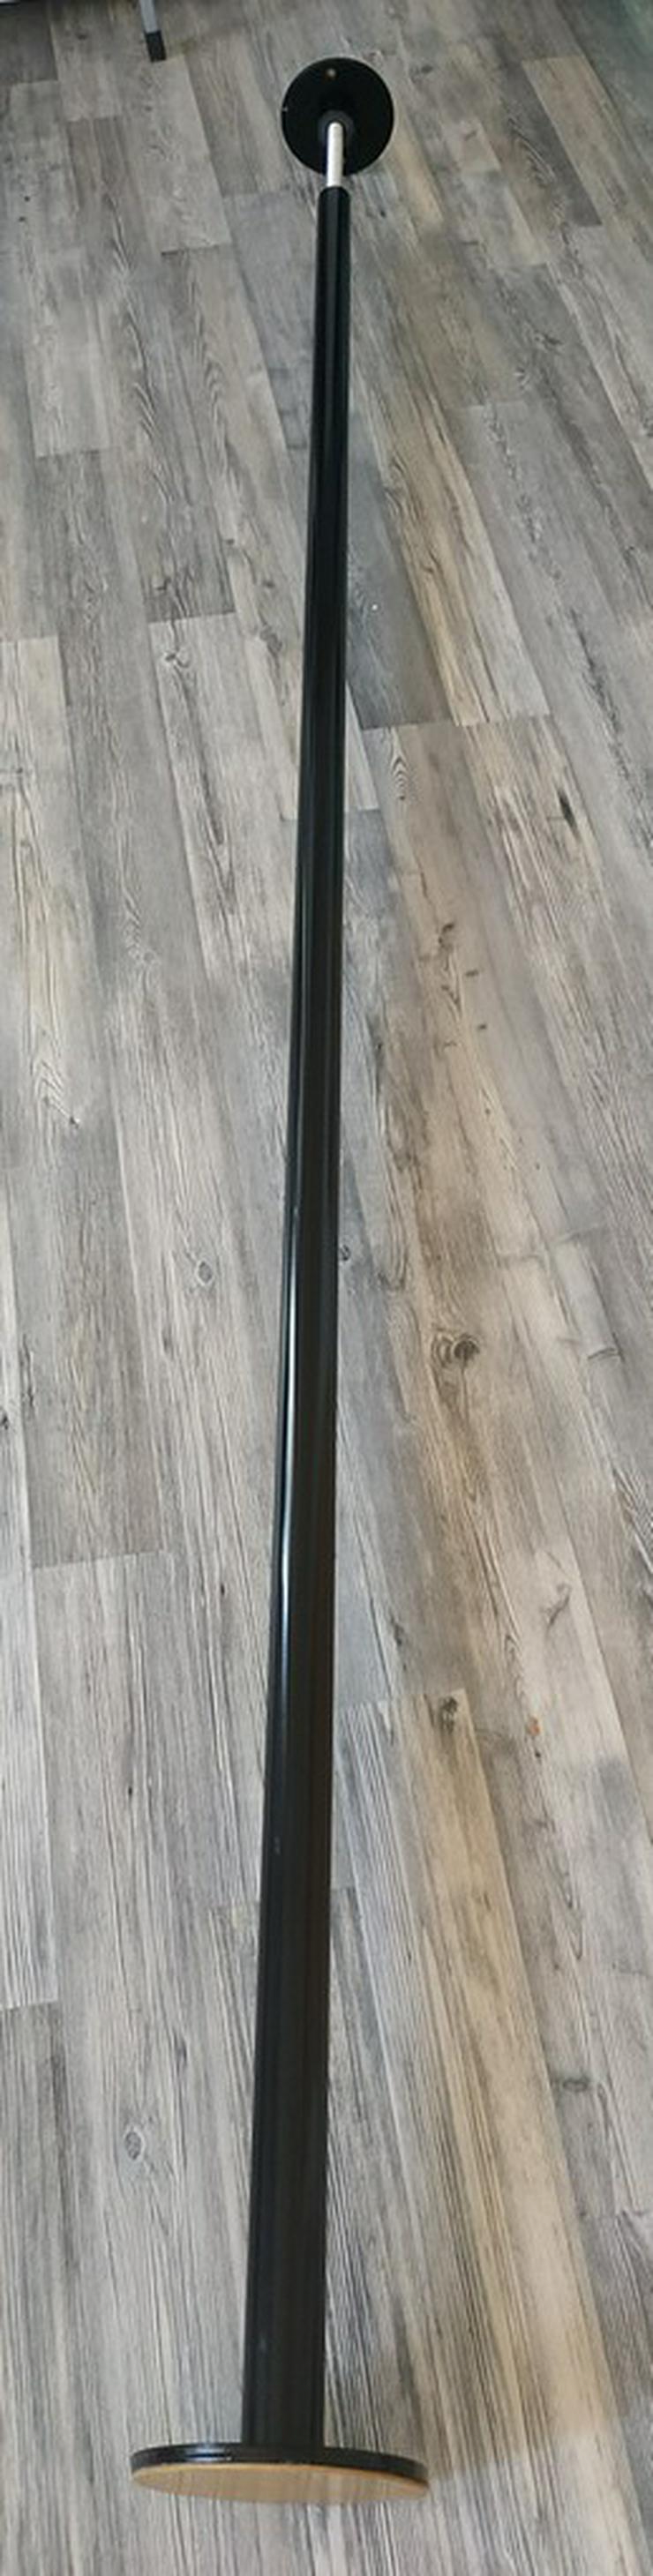 Professionelle Poledance-Stange, static, 45mm